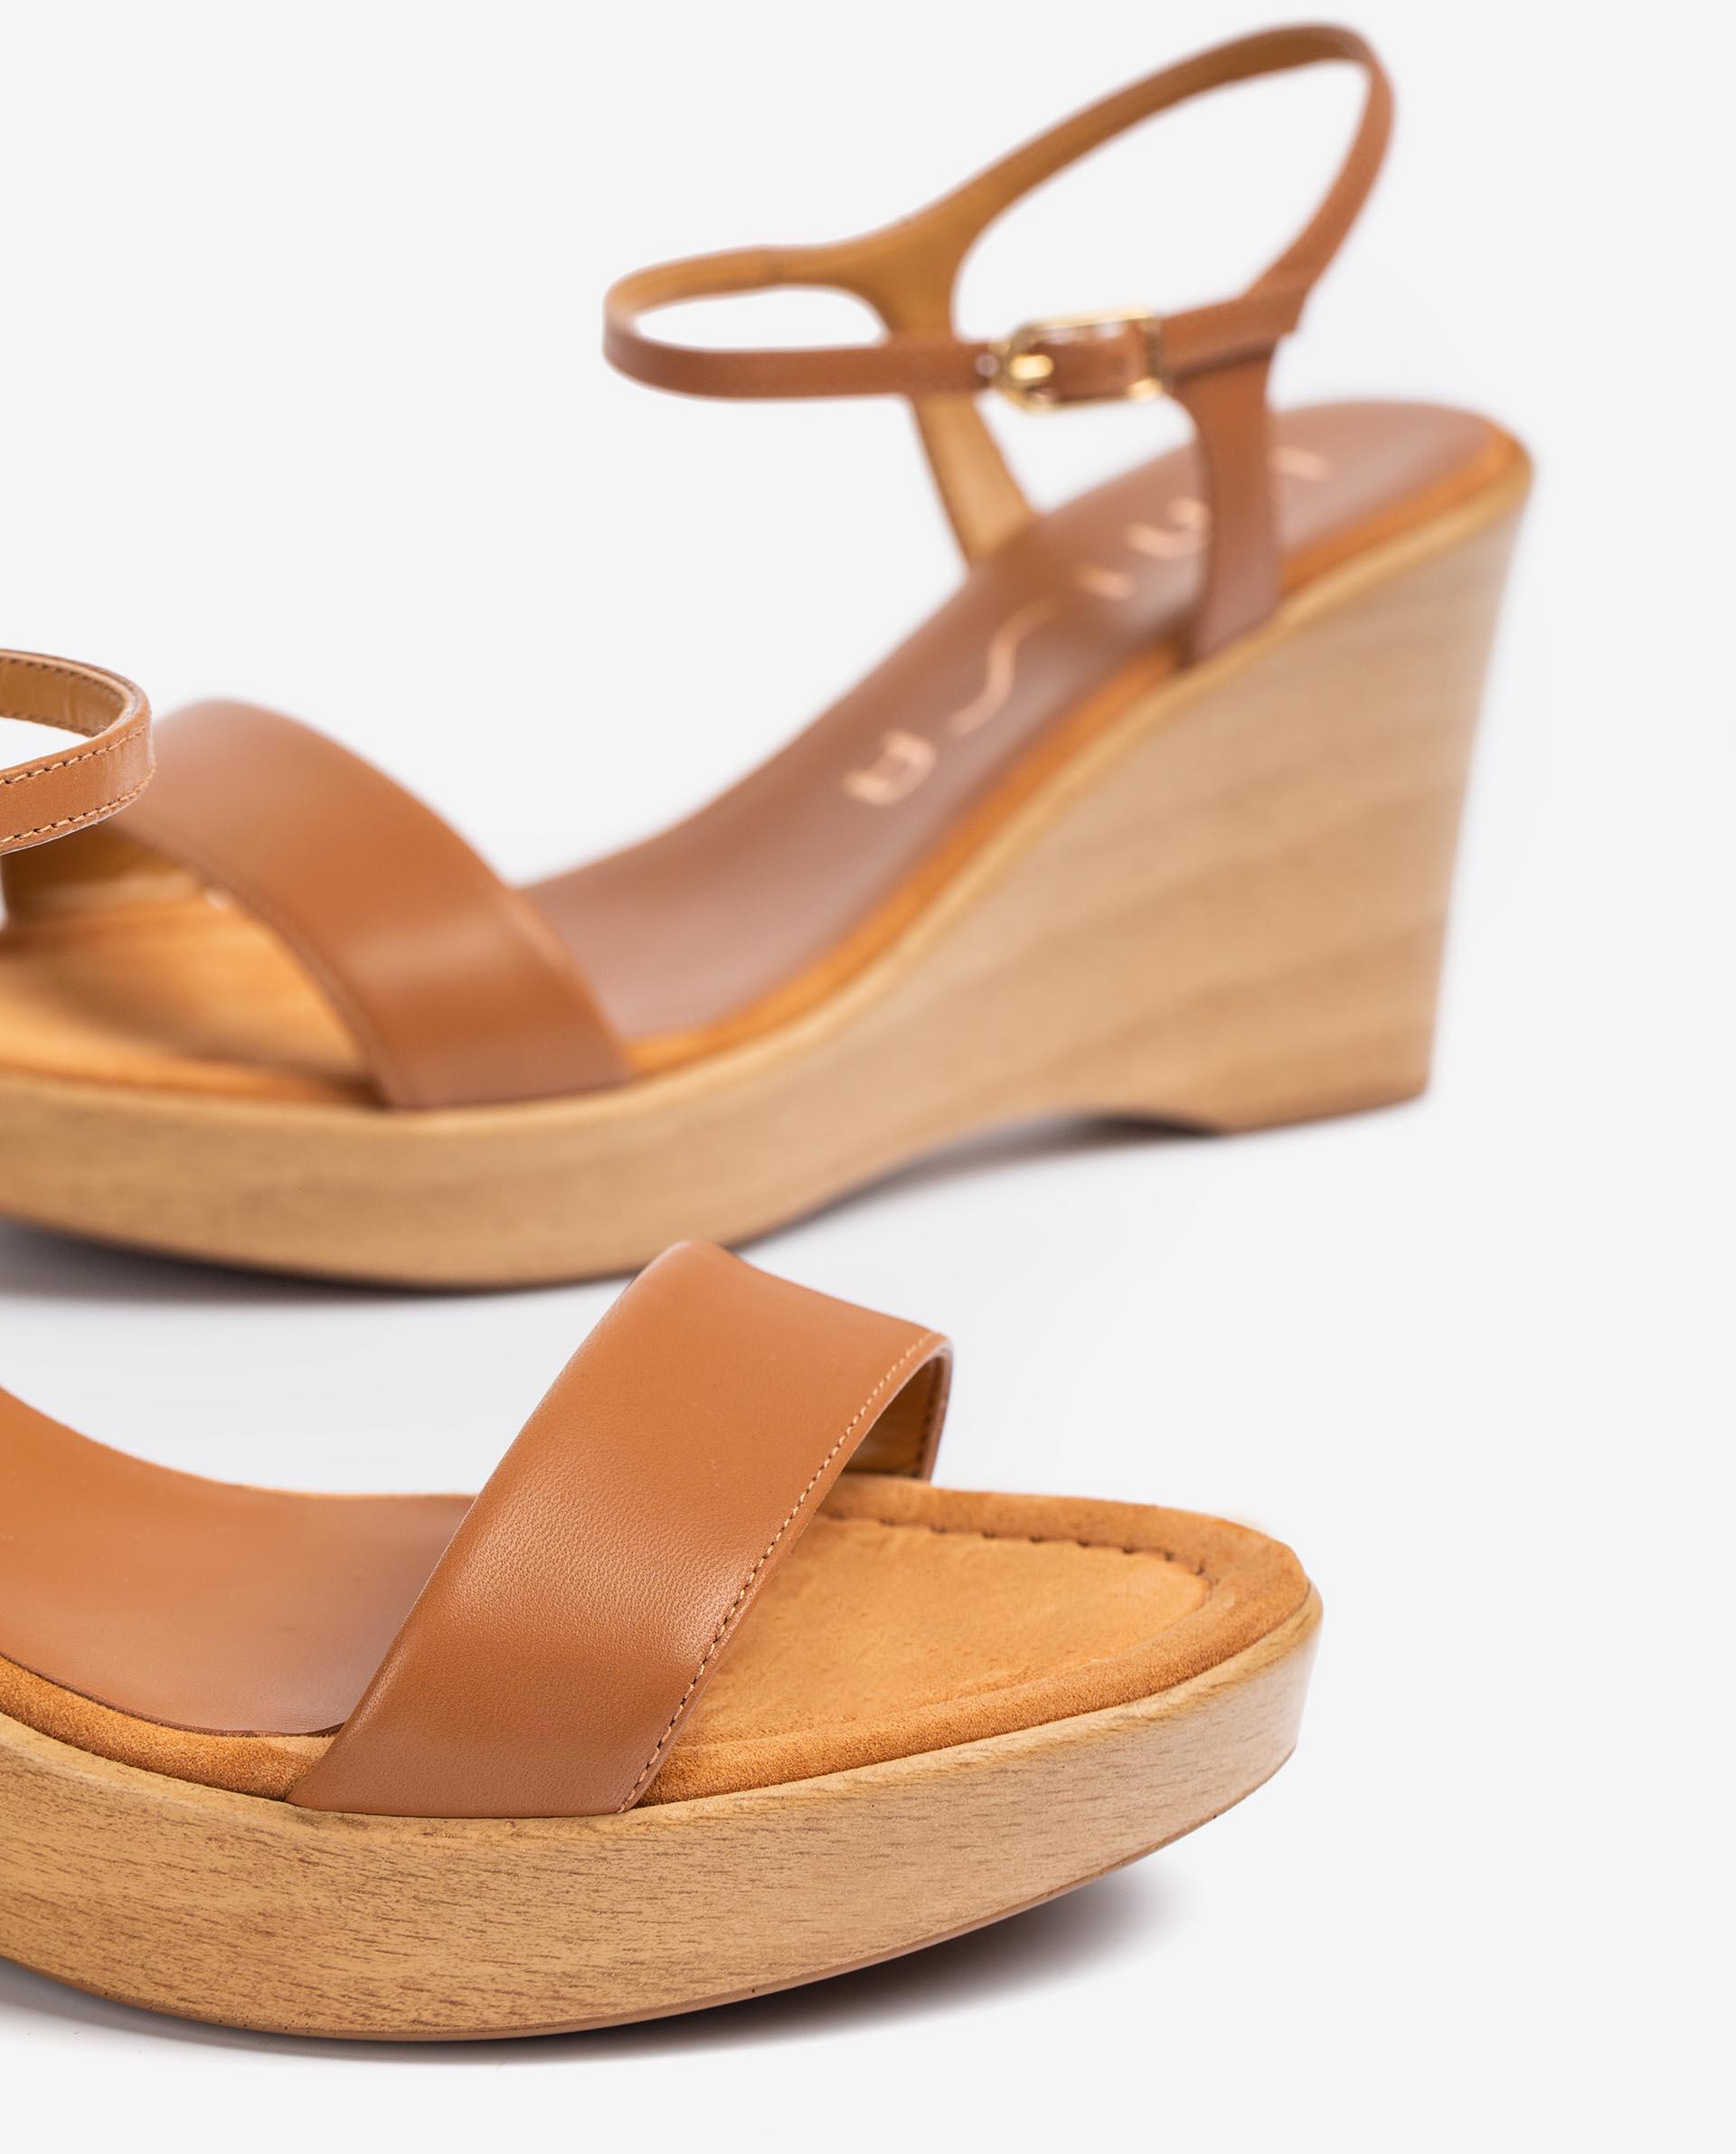 UNISA Leather wedge sandals RITA_21_NA 2